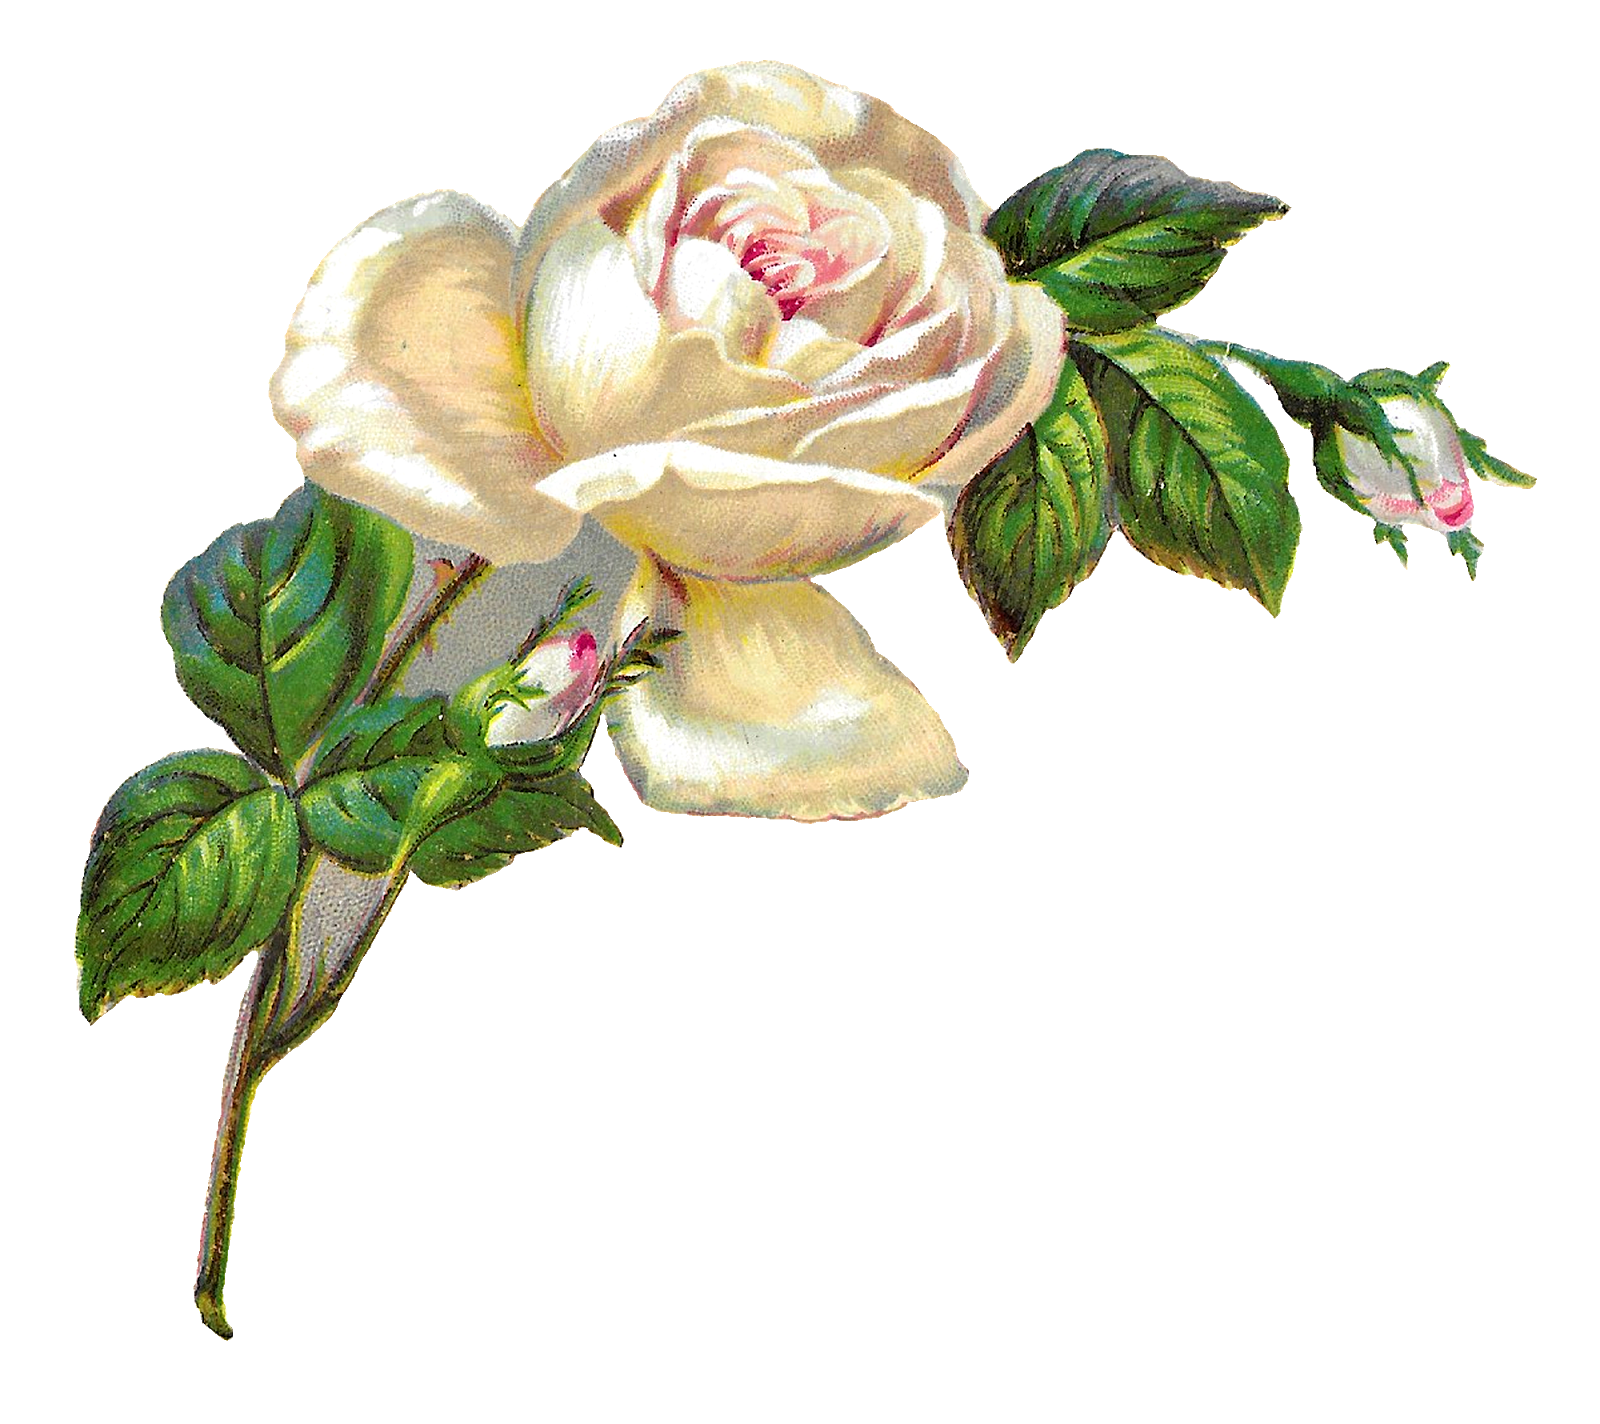 Antique Images White Rose Shabby Chic Flower Image Clip Art